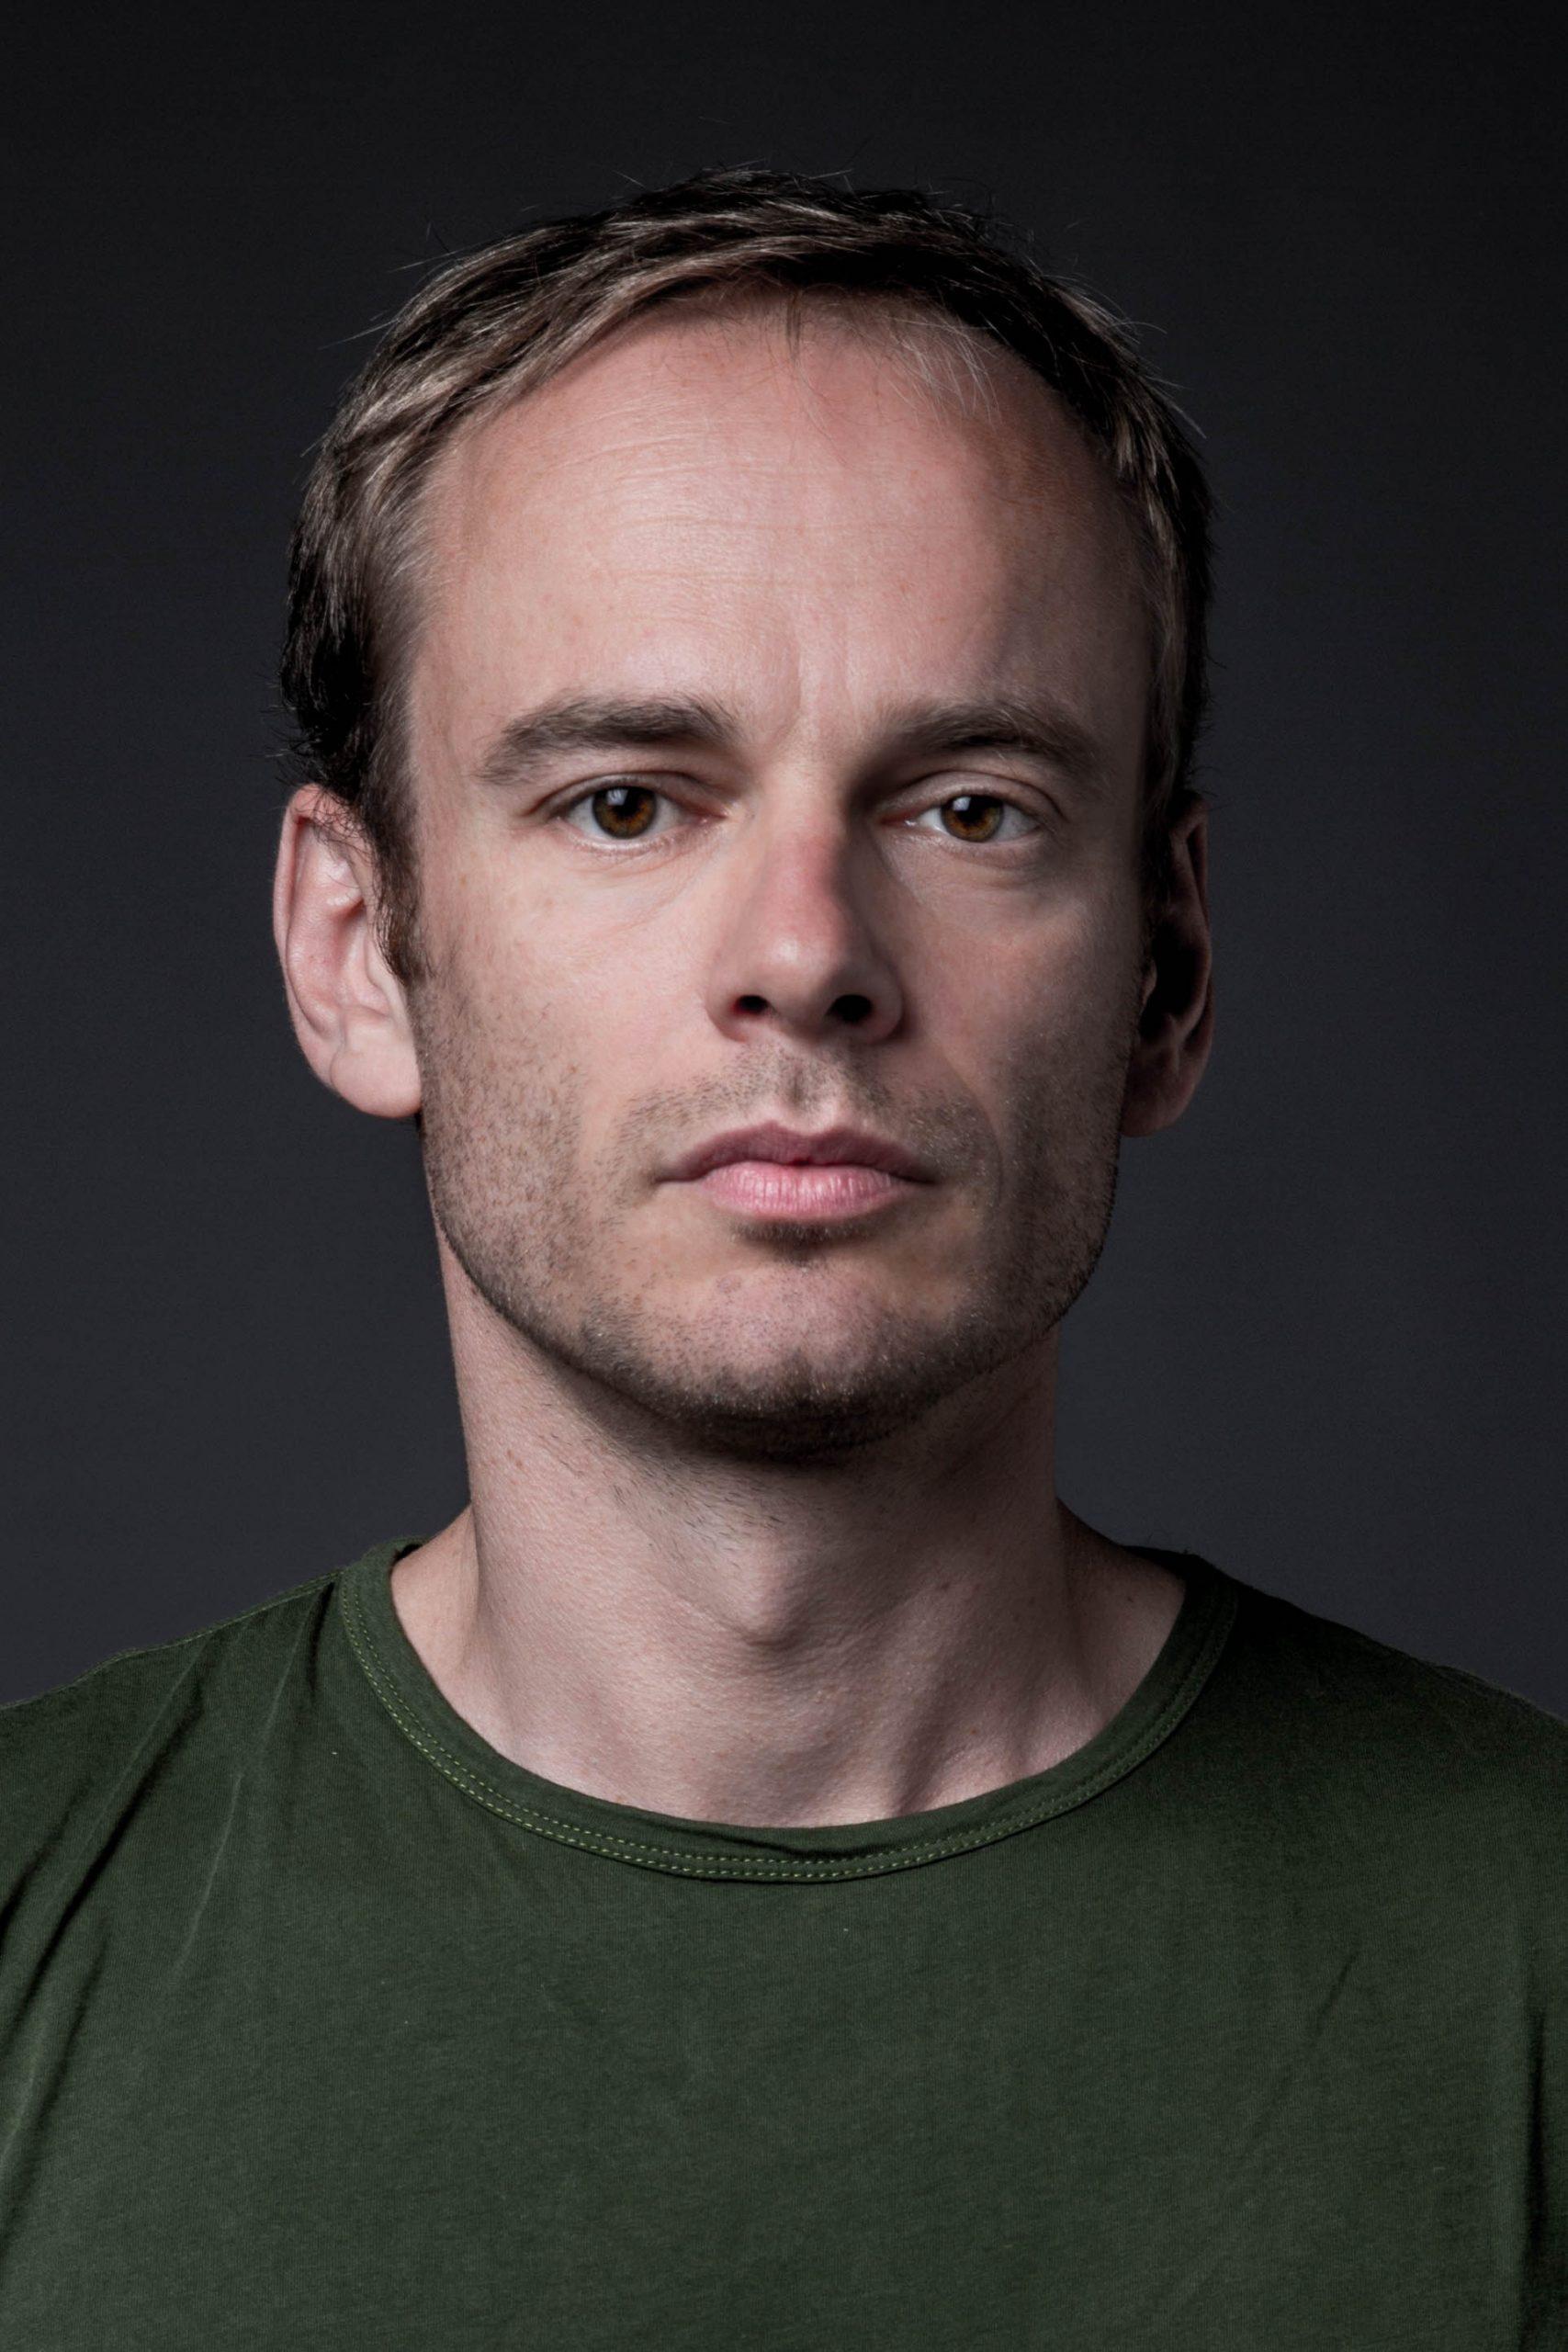 Thomas Ryckewaert Belgian Actor